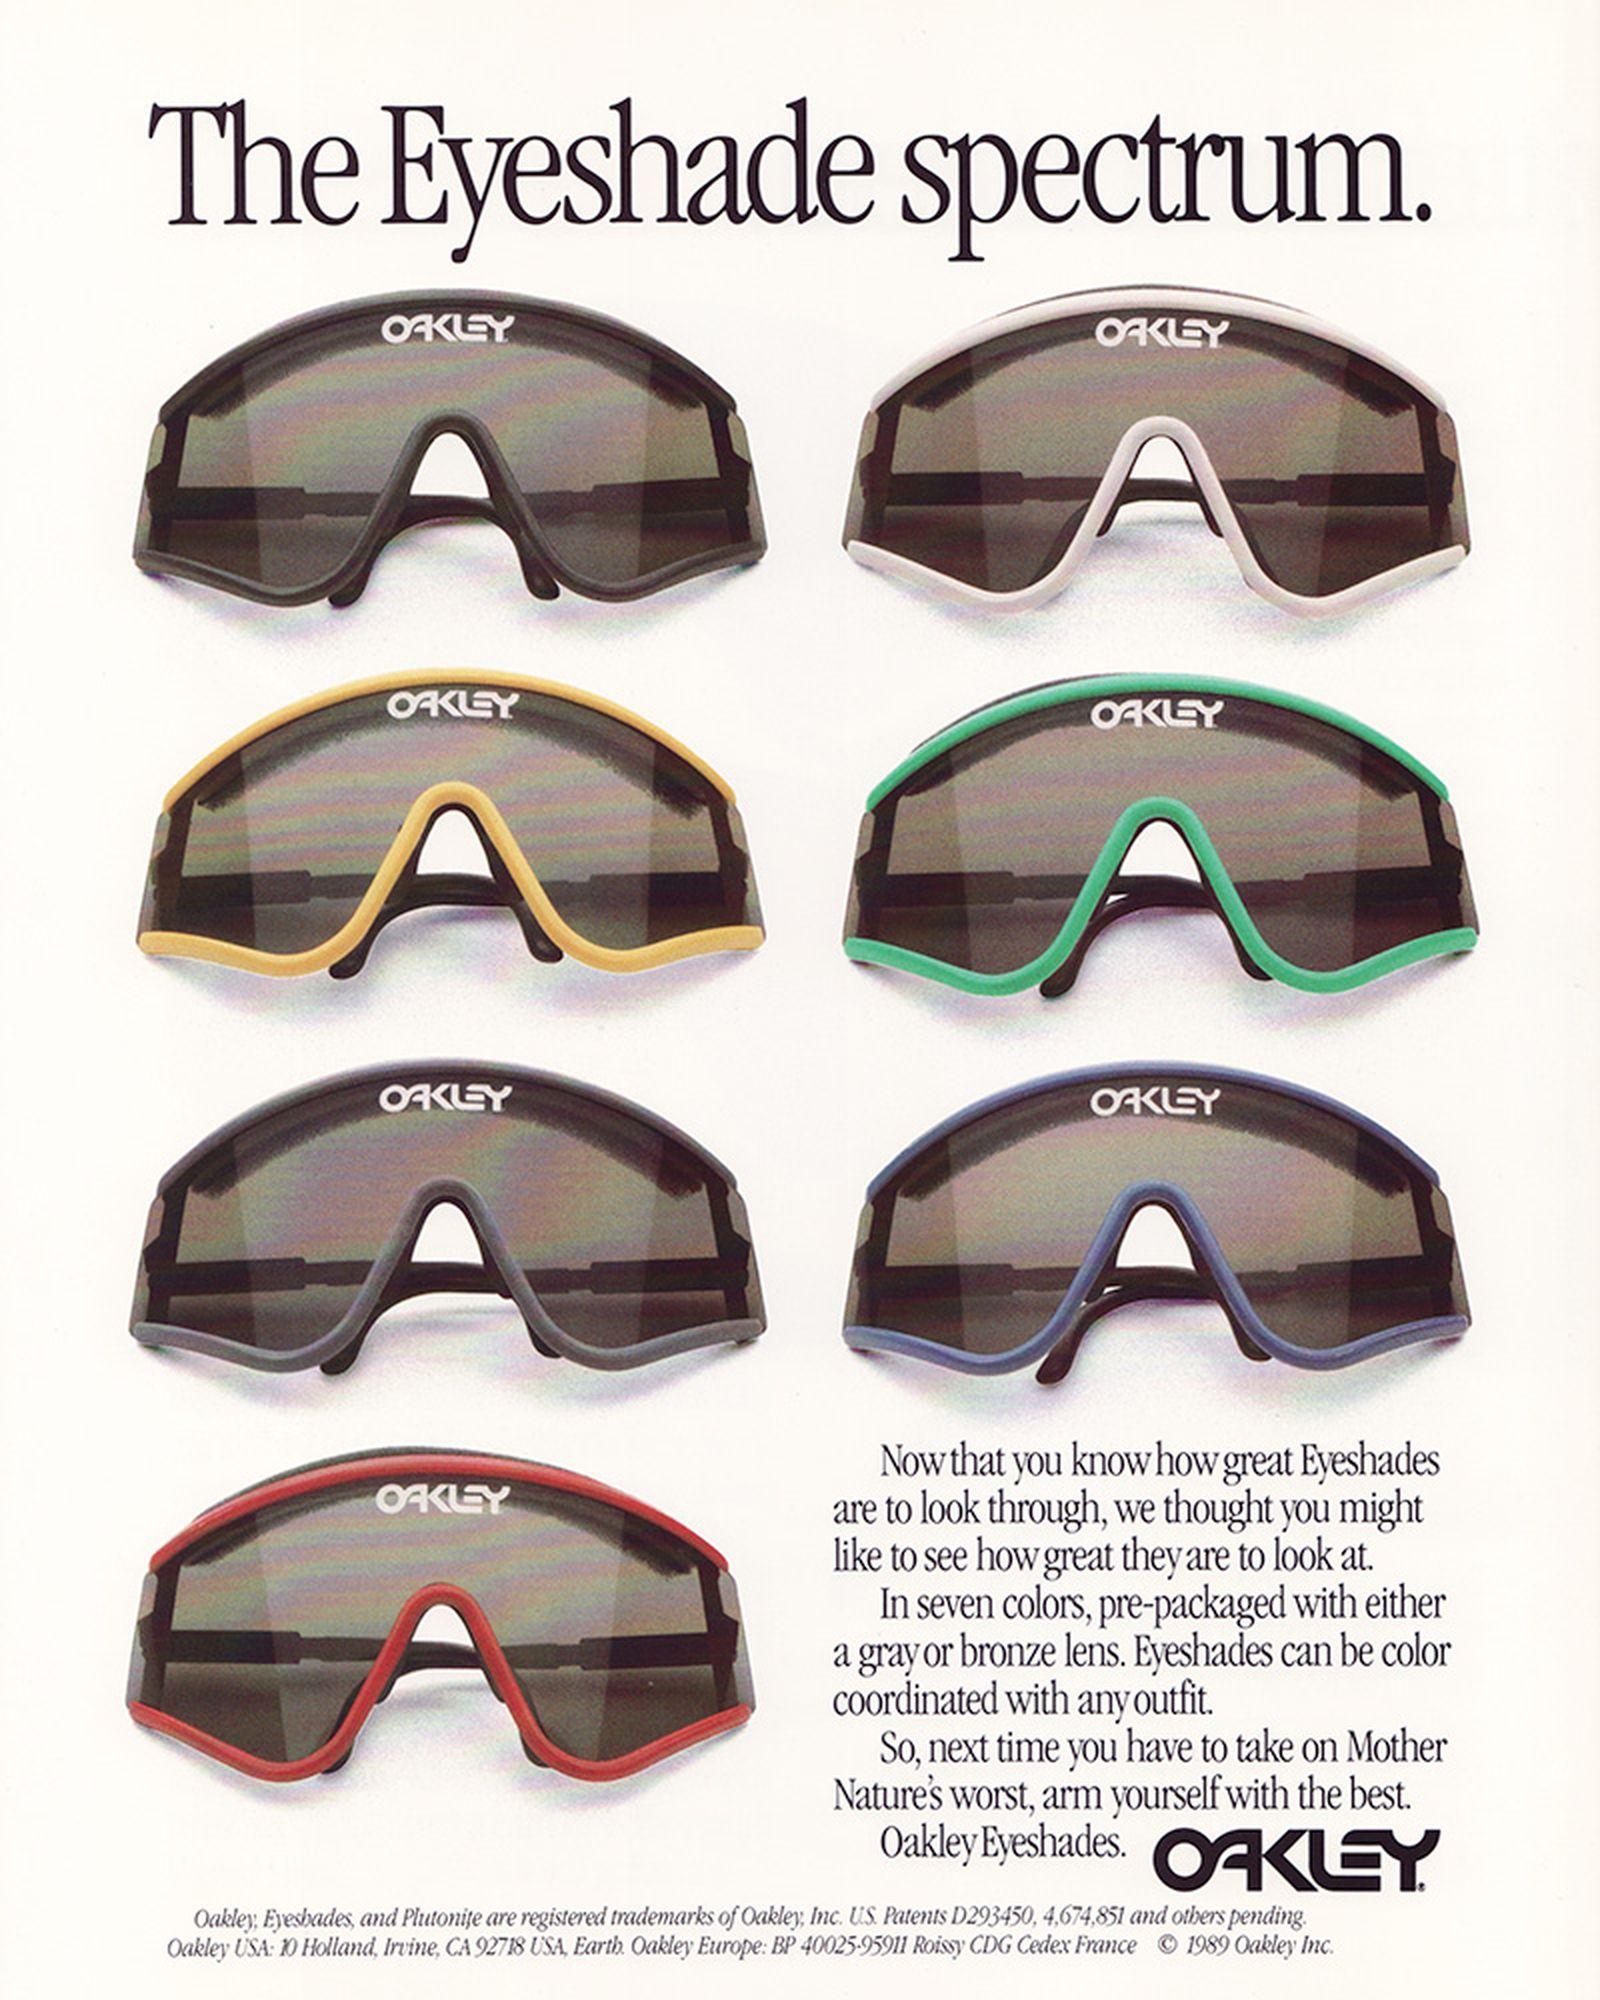 historical-clarity-oakleys-lens-tech-keeps-getting-sharper-04